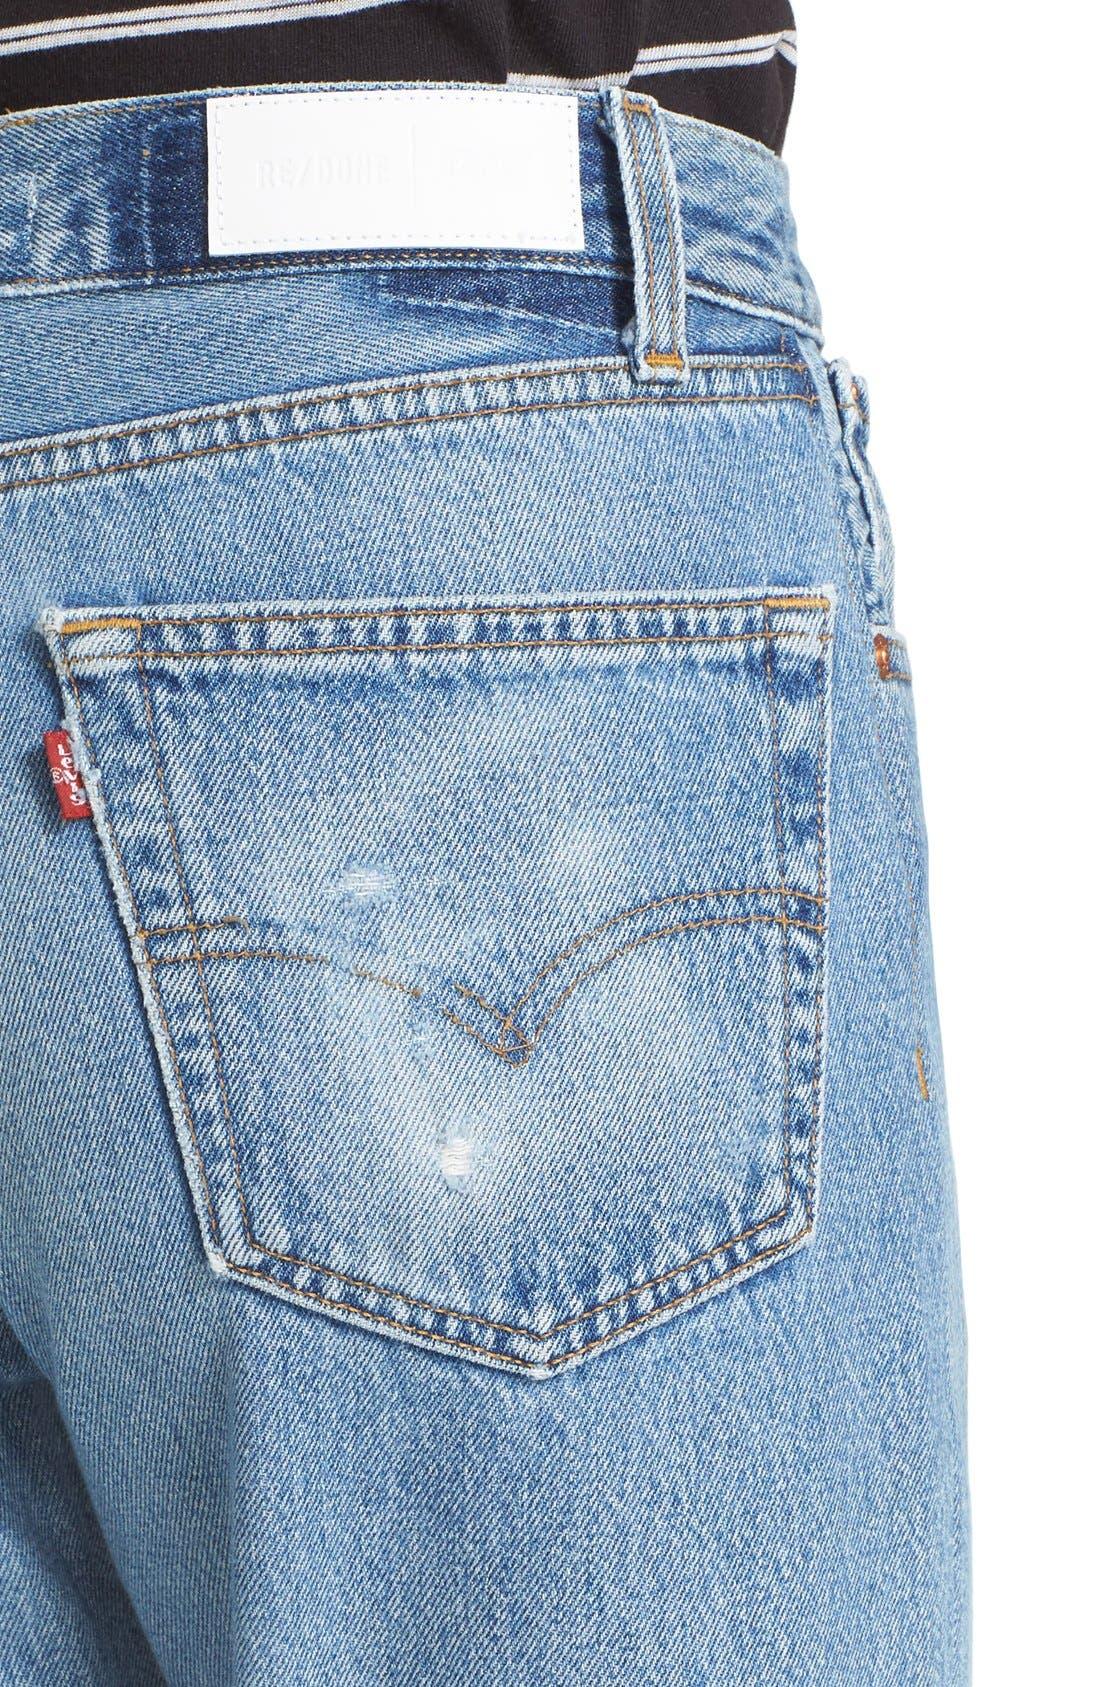 Reconstructed High Waist Ankle Crop Jeans,                             Alternate thumbnail 5, color,                             NO DESTRUCTION